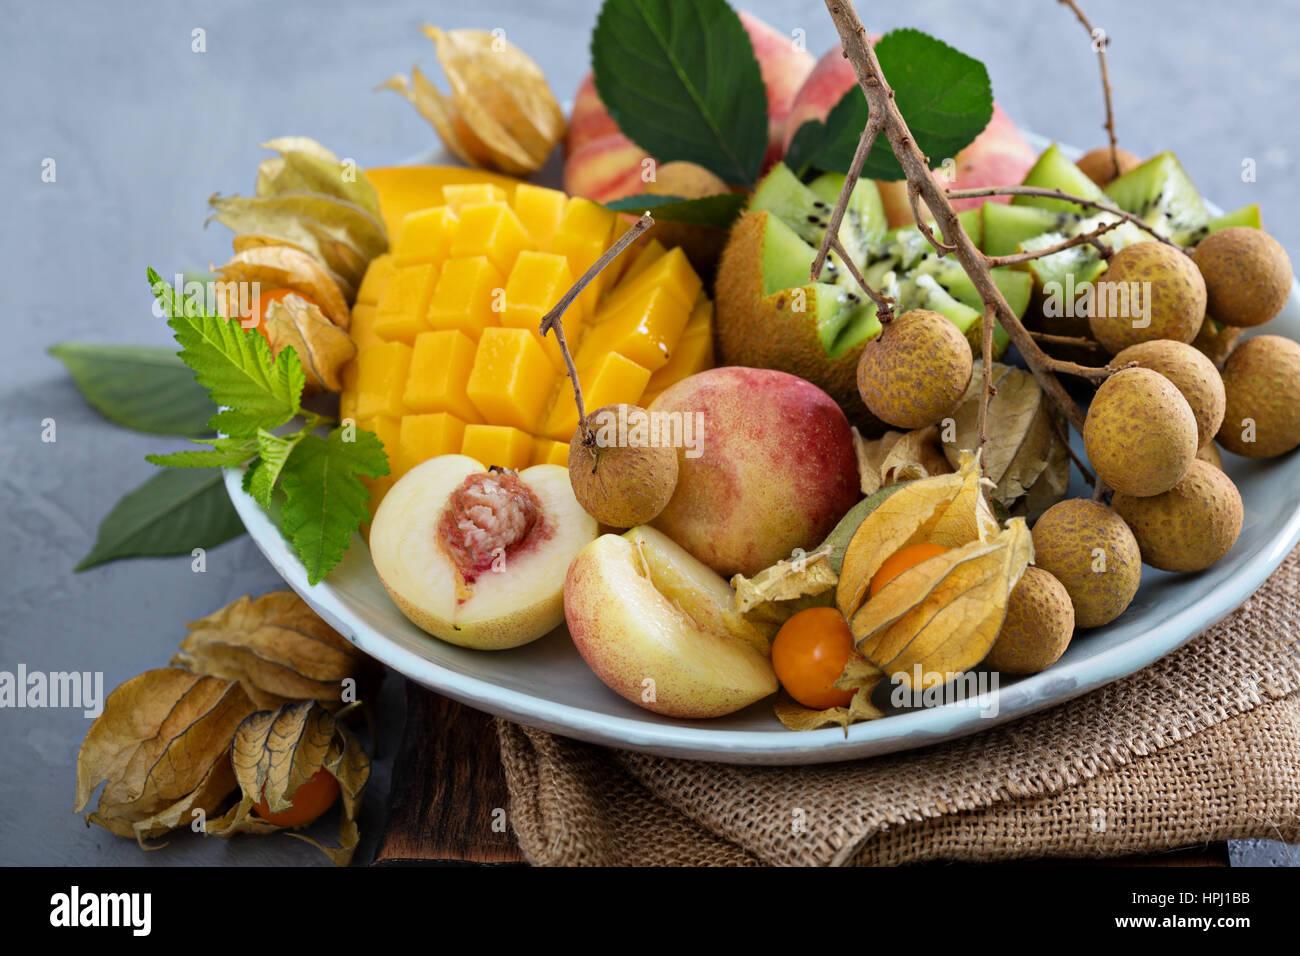 Tropical fruit plate with mango, apricots, longan and kiwi - Stock Image